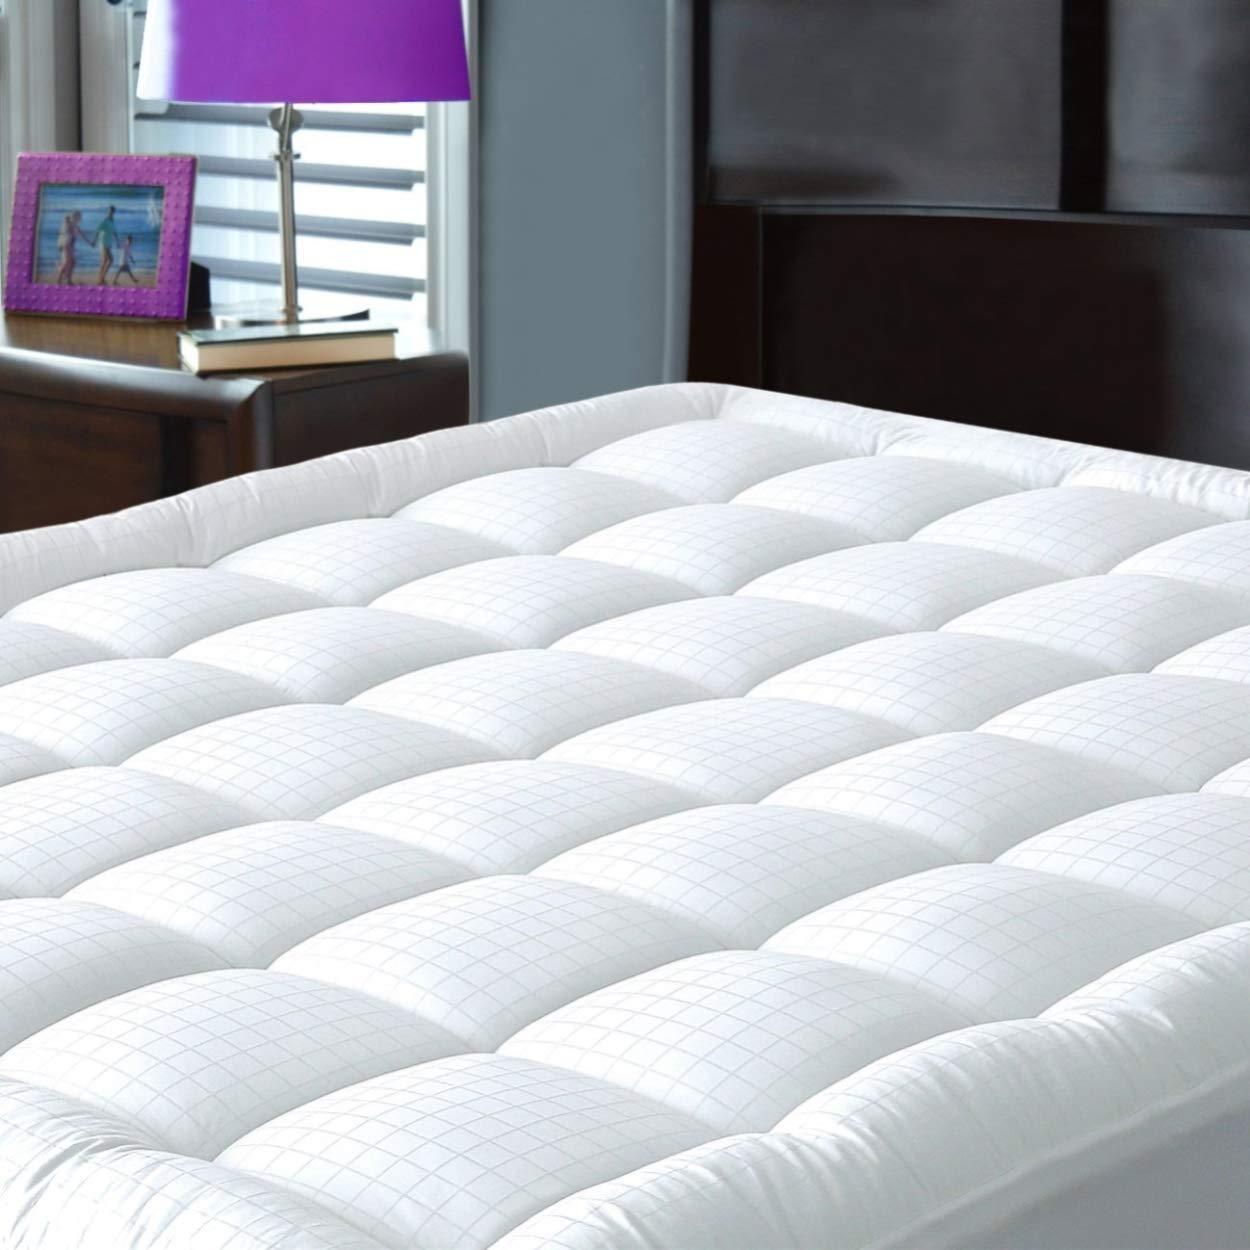 JURLYNE Pillowtop Mattress Pad Cover Queen Size - Hypoallergenic - Cotton Down Alternative Filled Mattress Topper